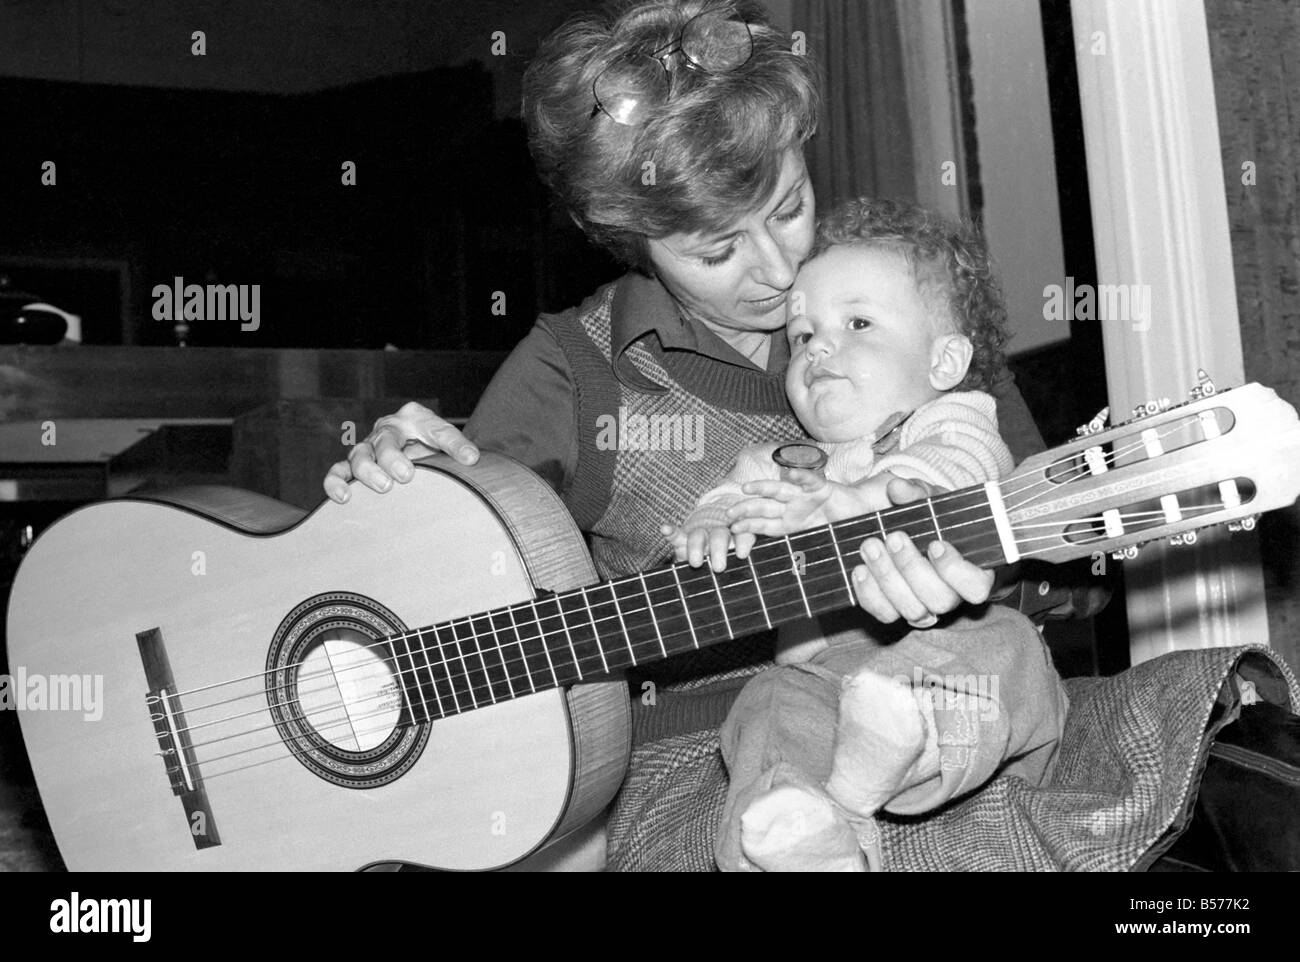 International singer star: Caterina Valente serenades her son. February 1975 75-00827-003 - Stock Image